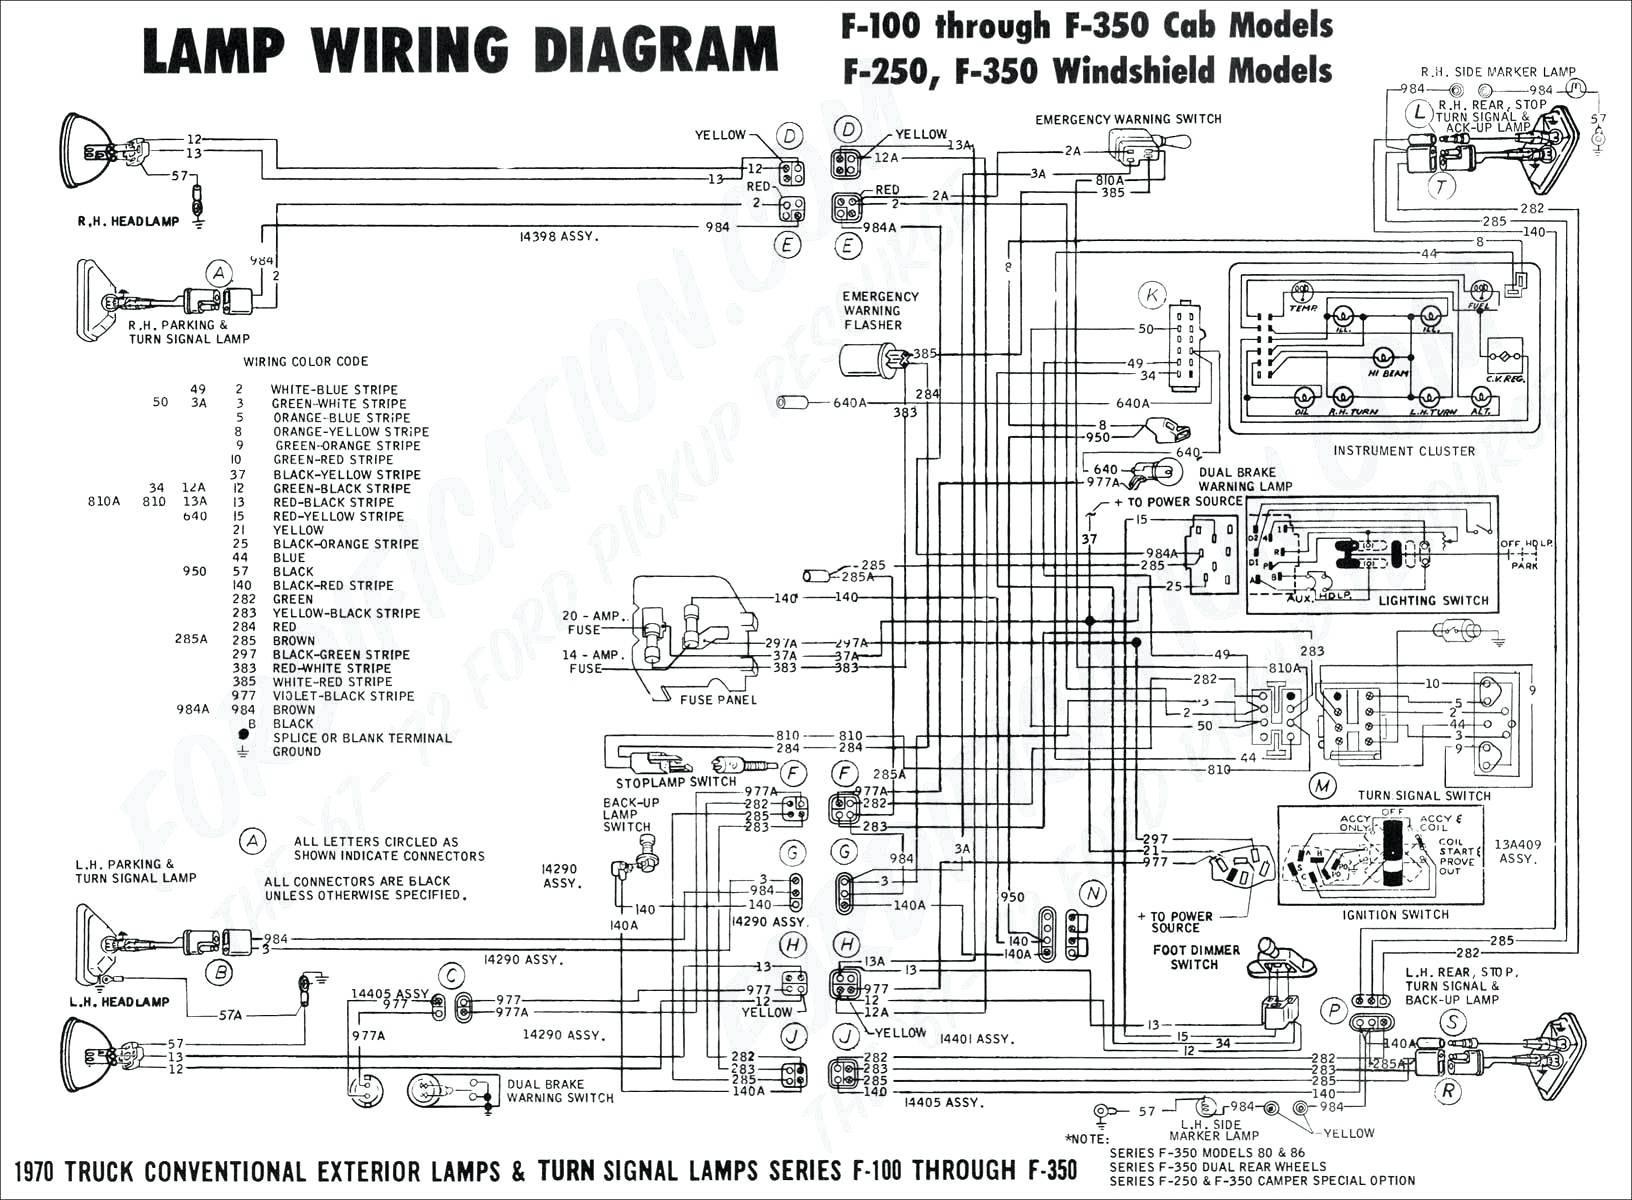 1995 Honda Civic Engine Diagram 99 Honda Civic Stereo Wiring Diagram Shahsramblings Of 1995 Honda Civic Engine Diagram